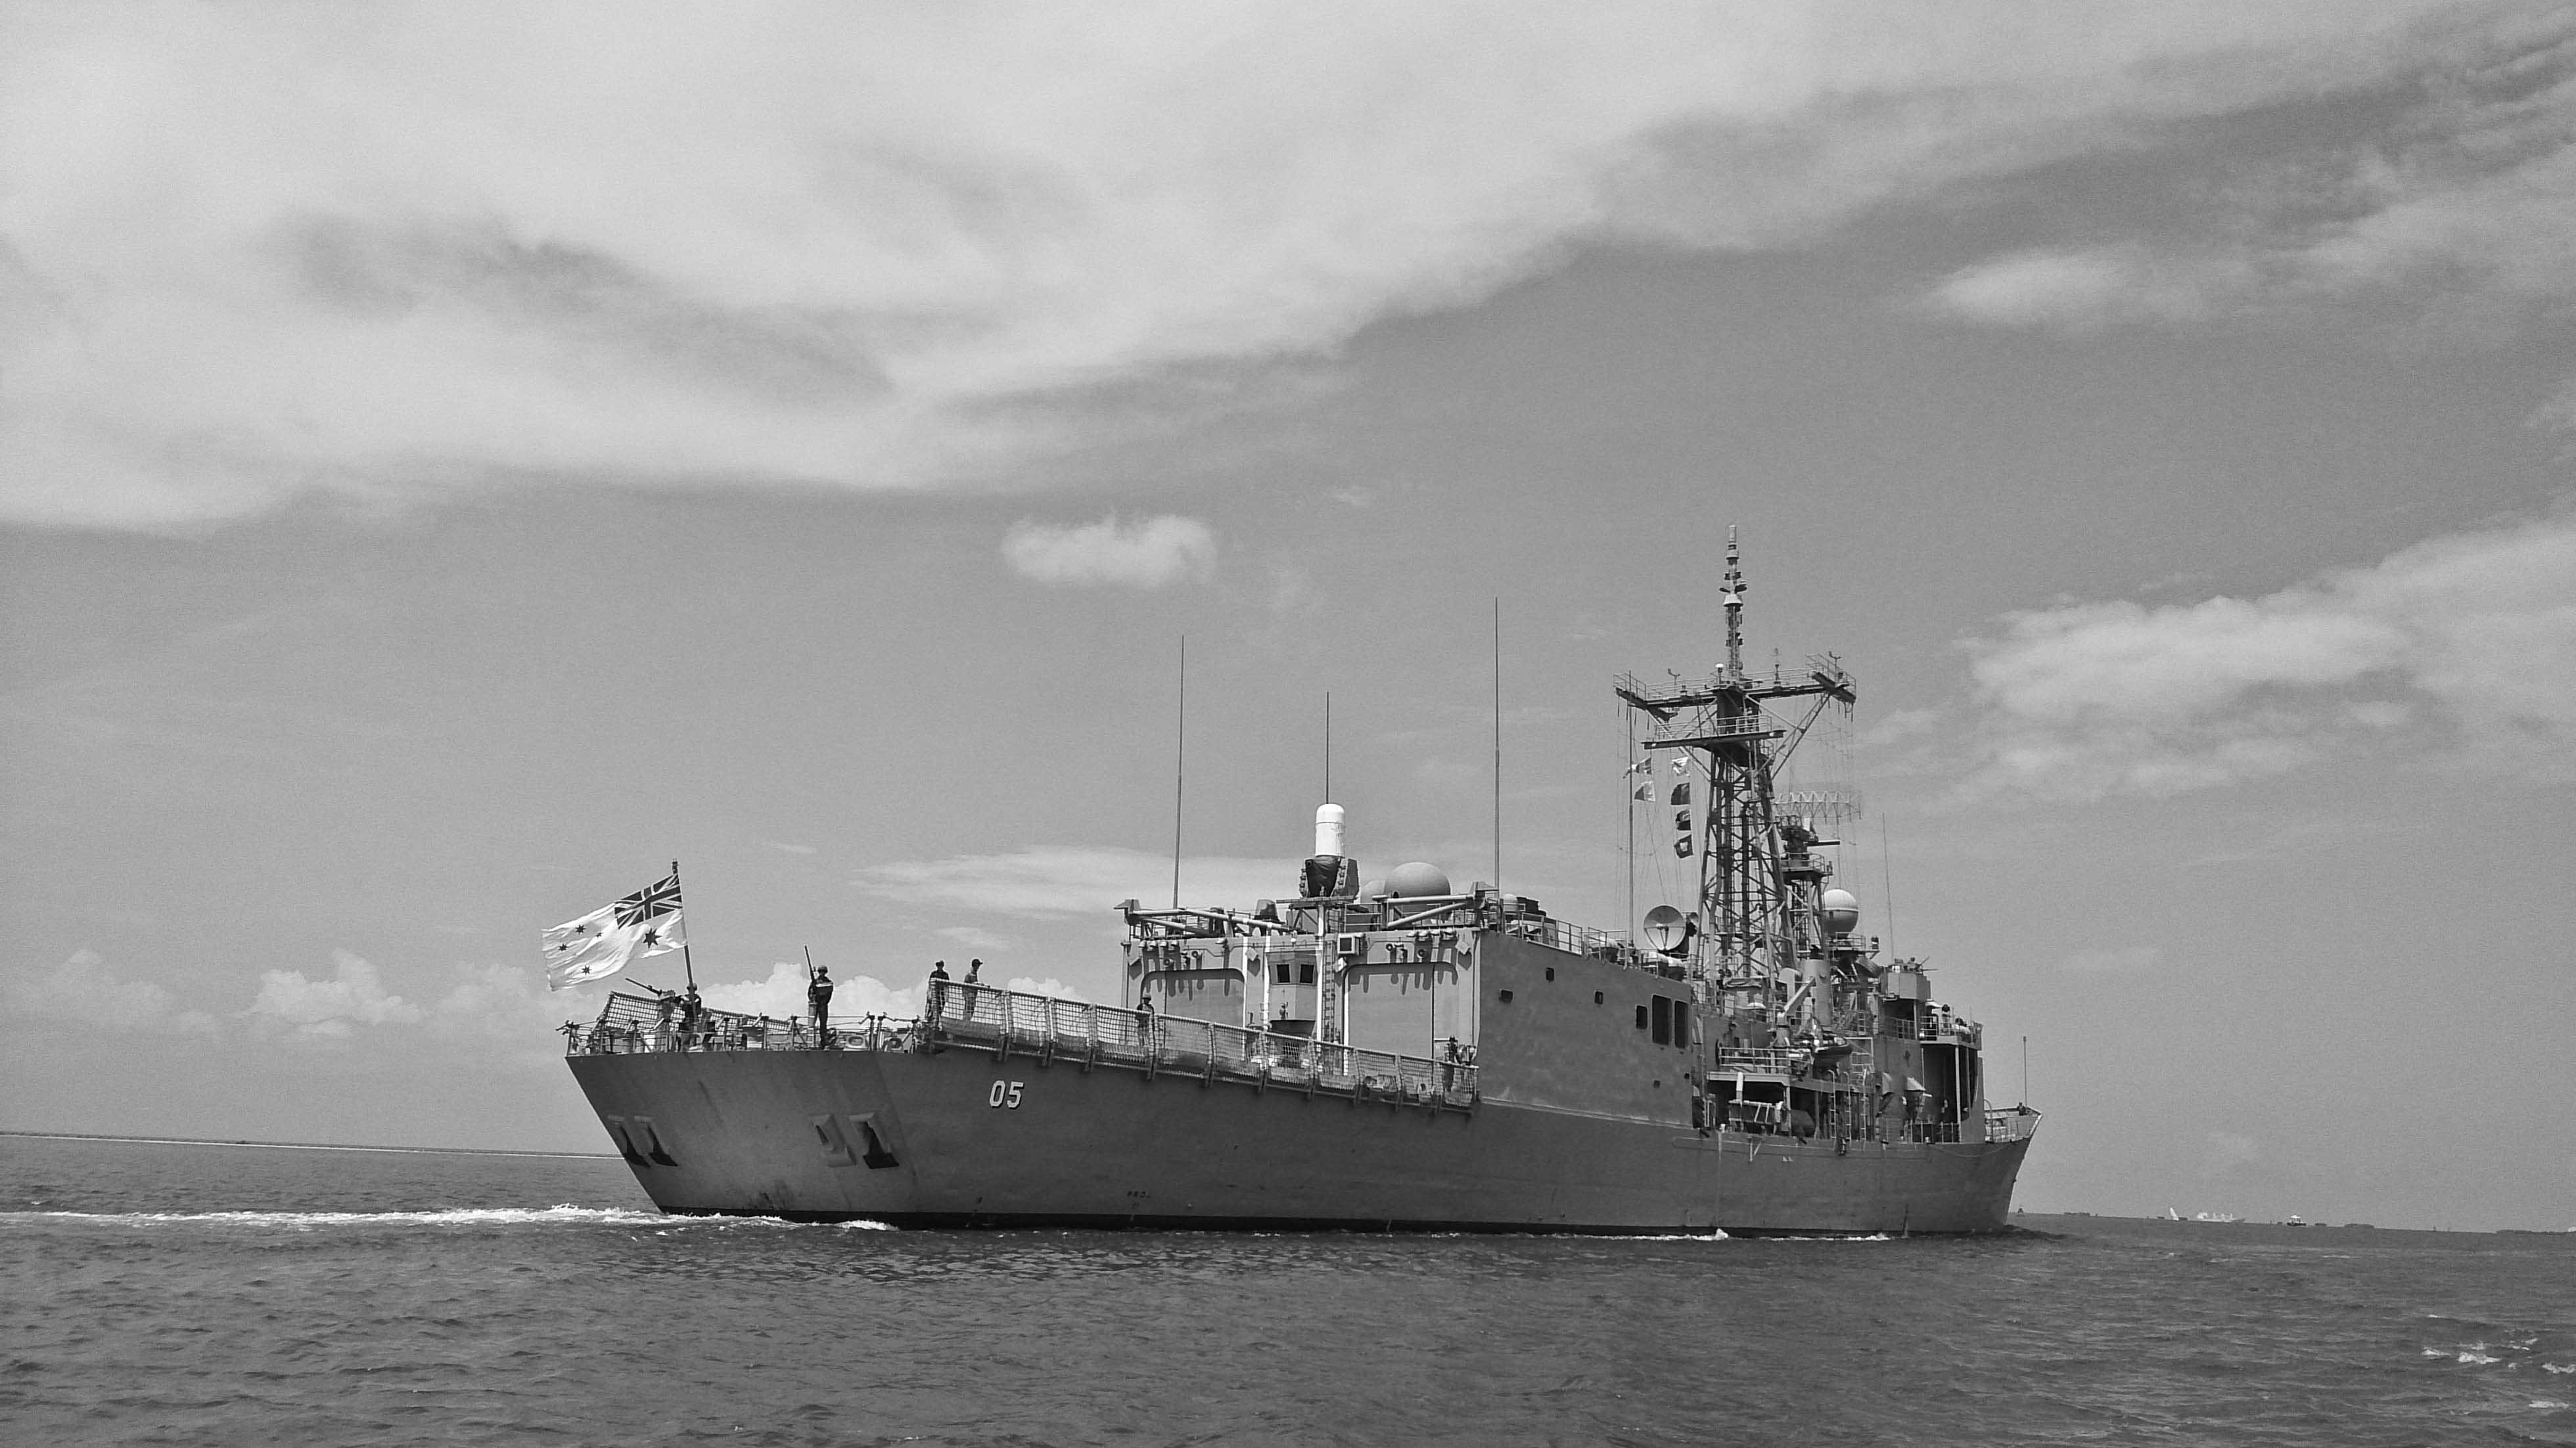 Battleship leaving Dar Es Salaam